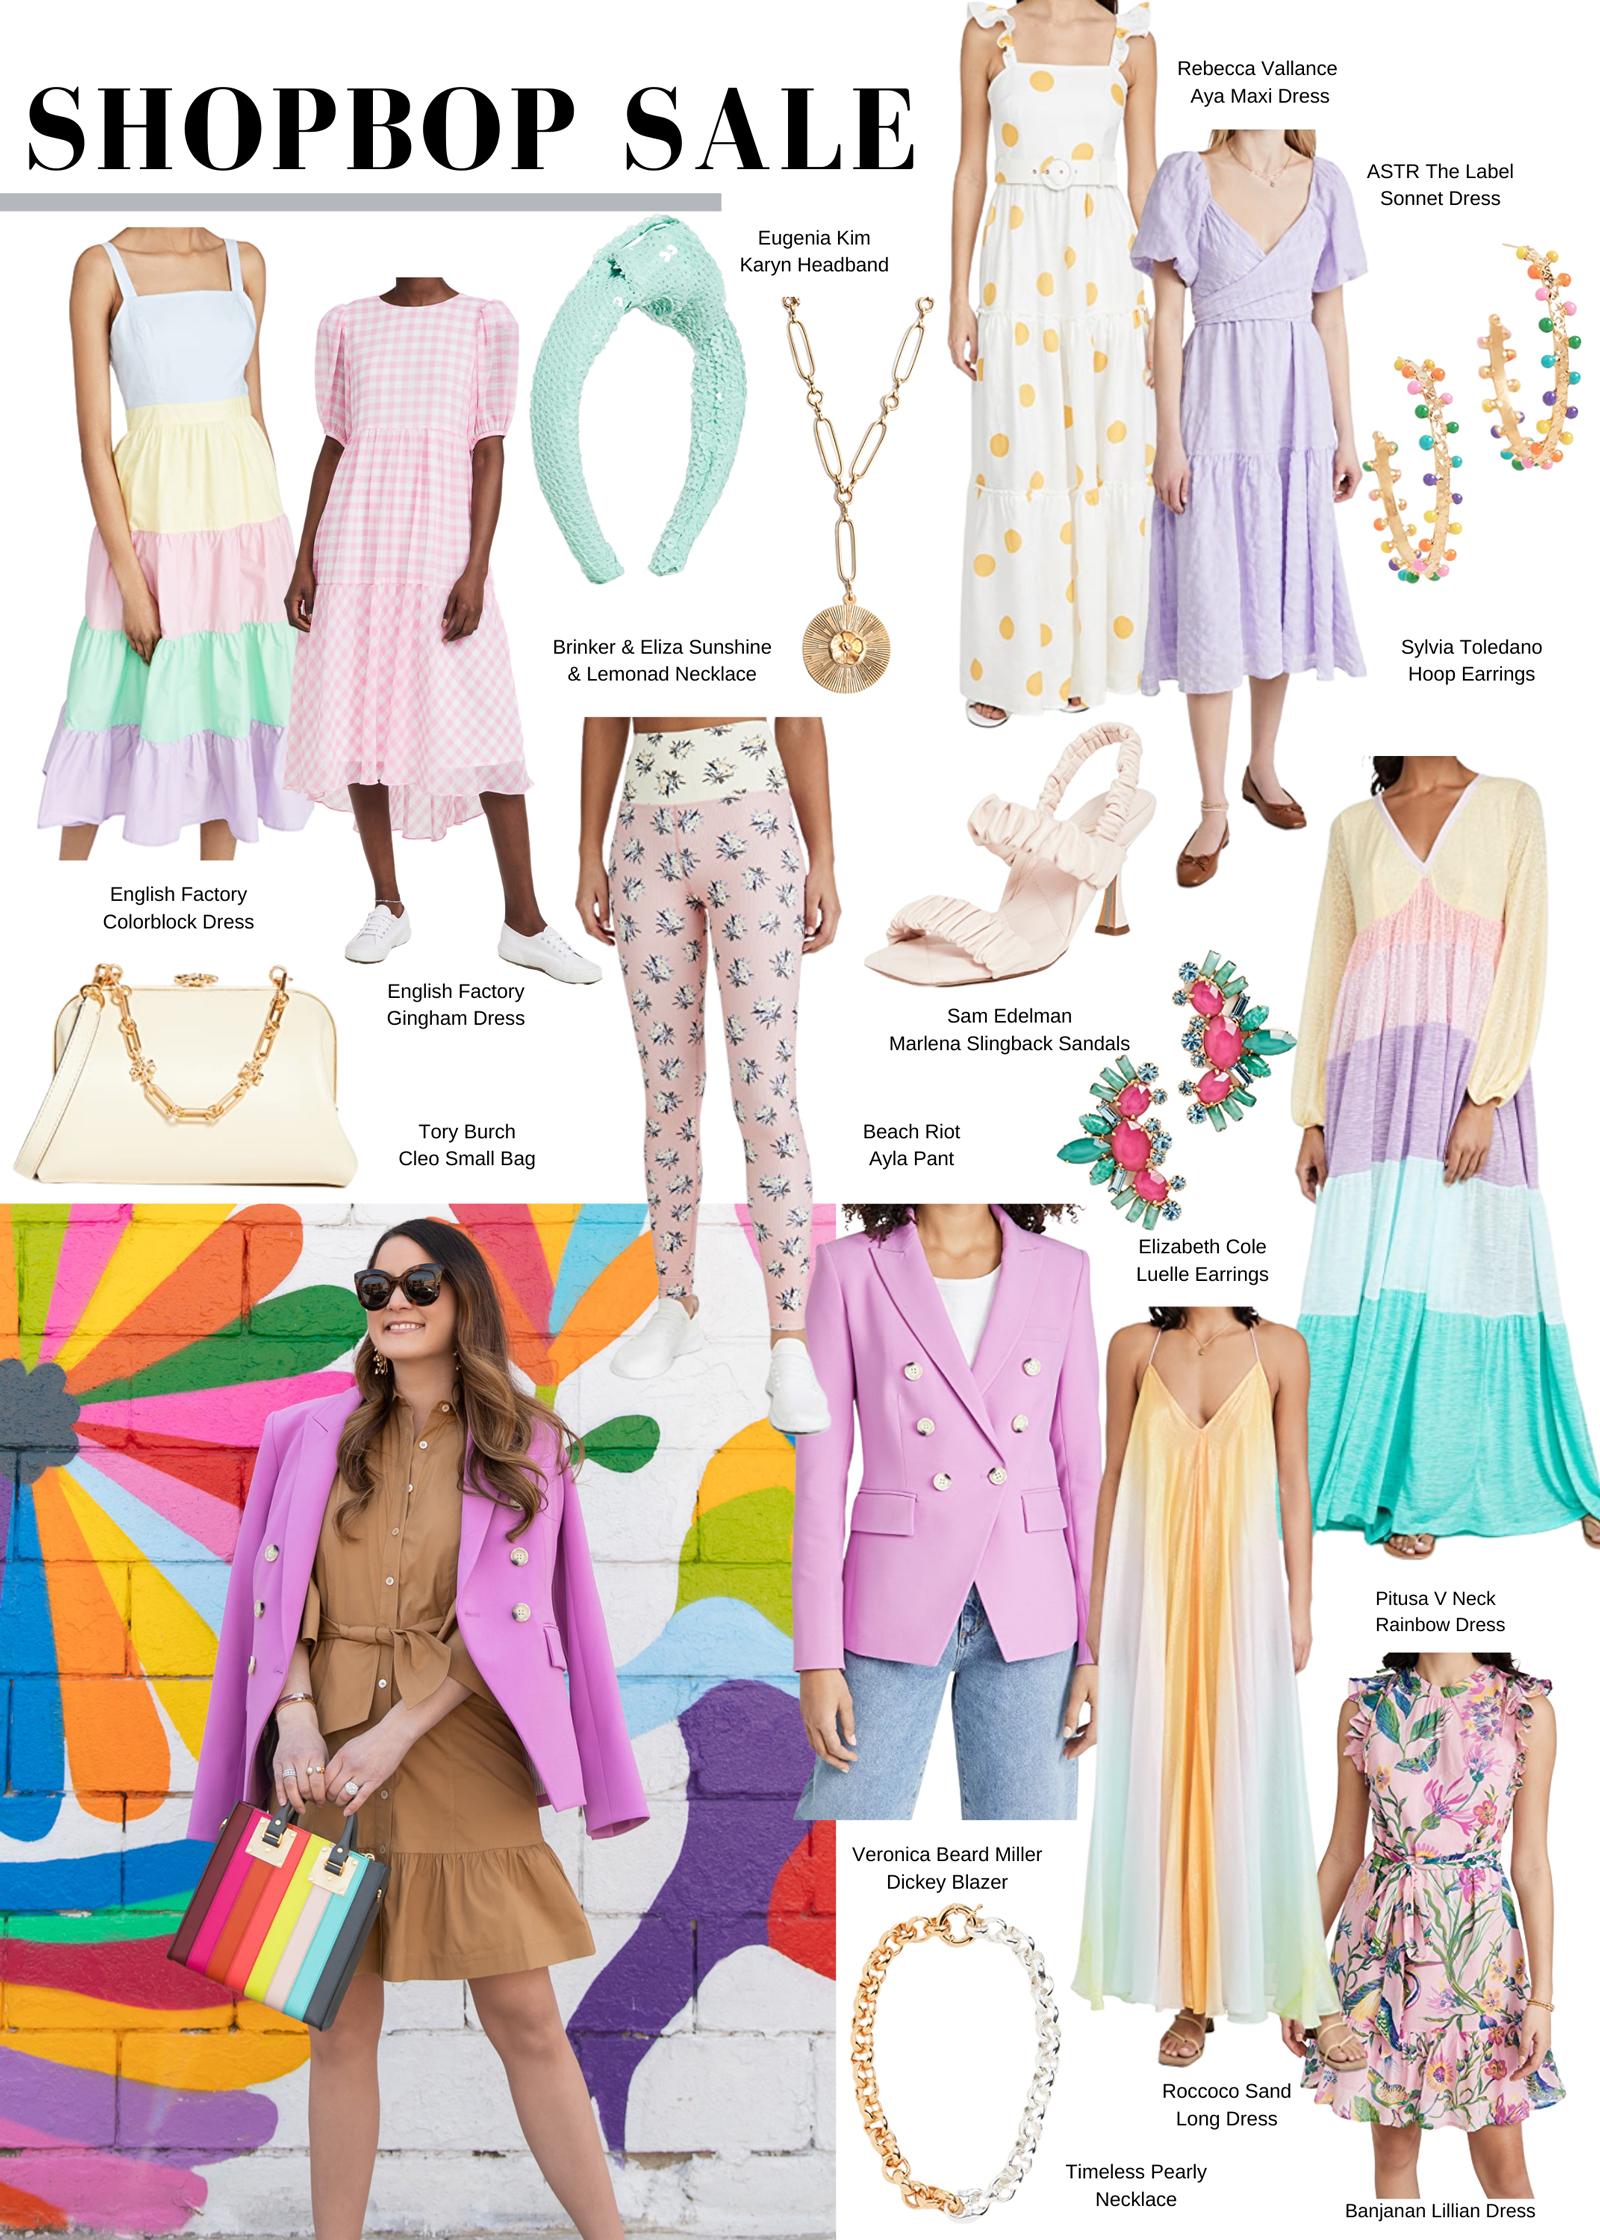 Shopbop Spring Sale 2021